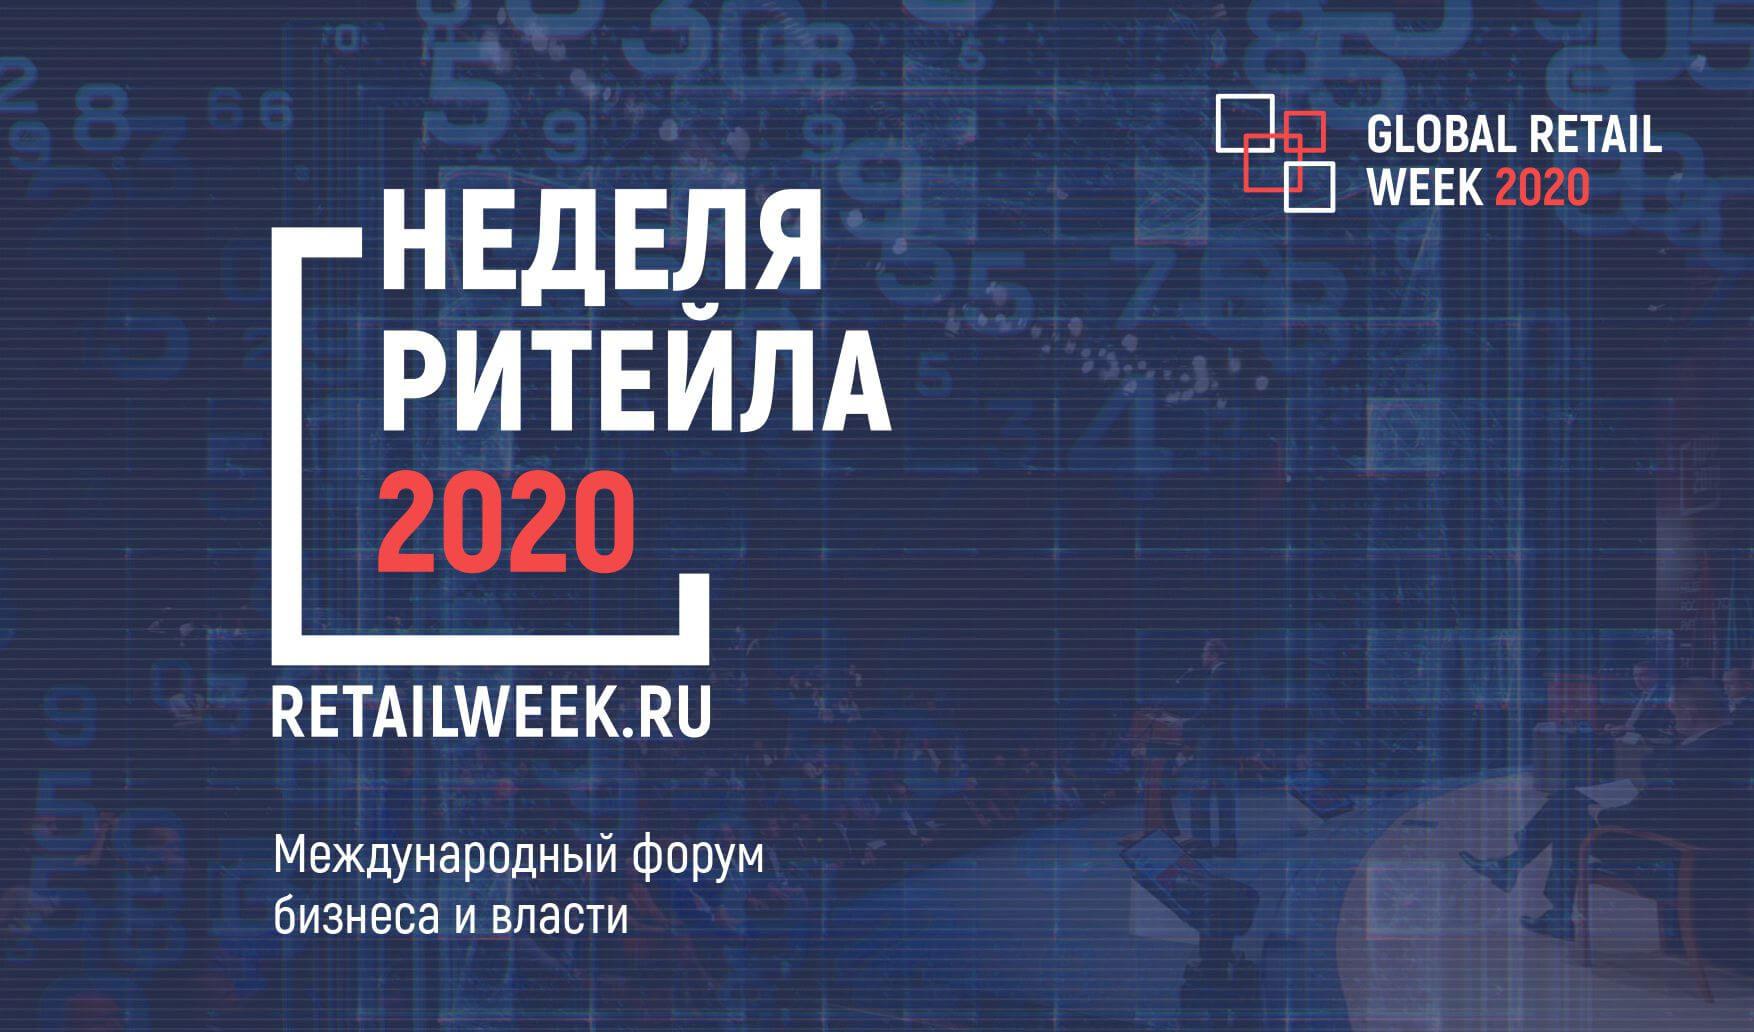 Неделя Ритейла 2020